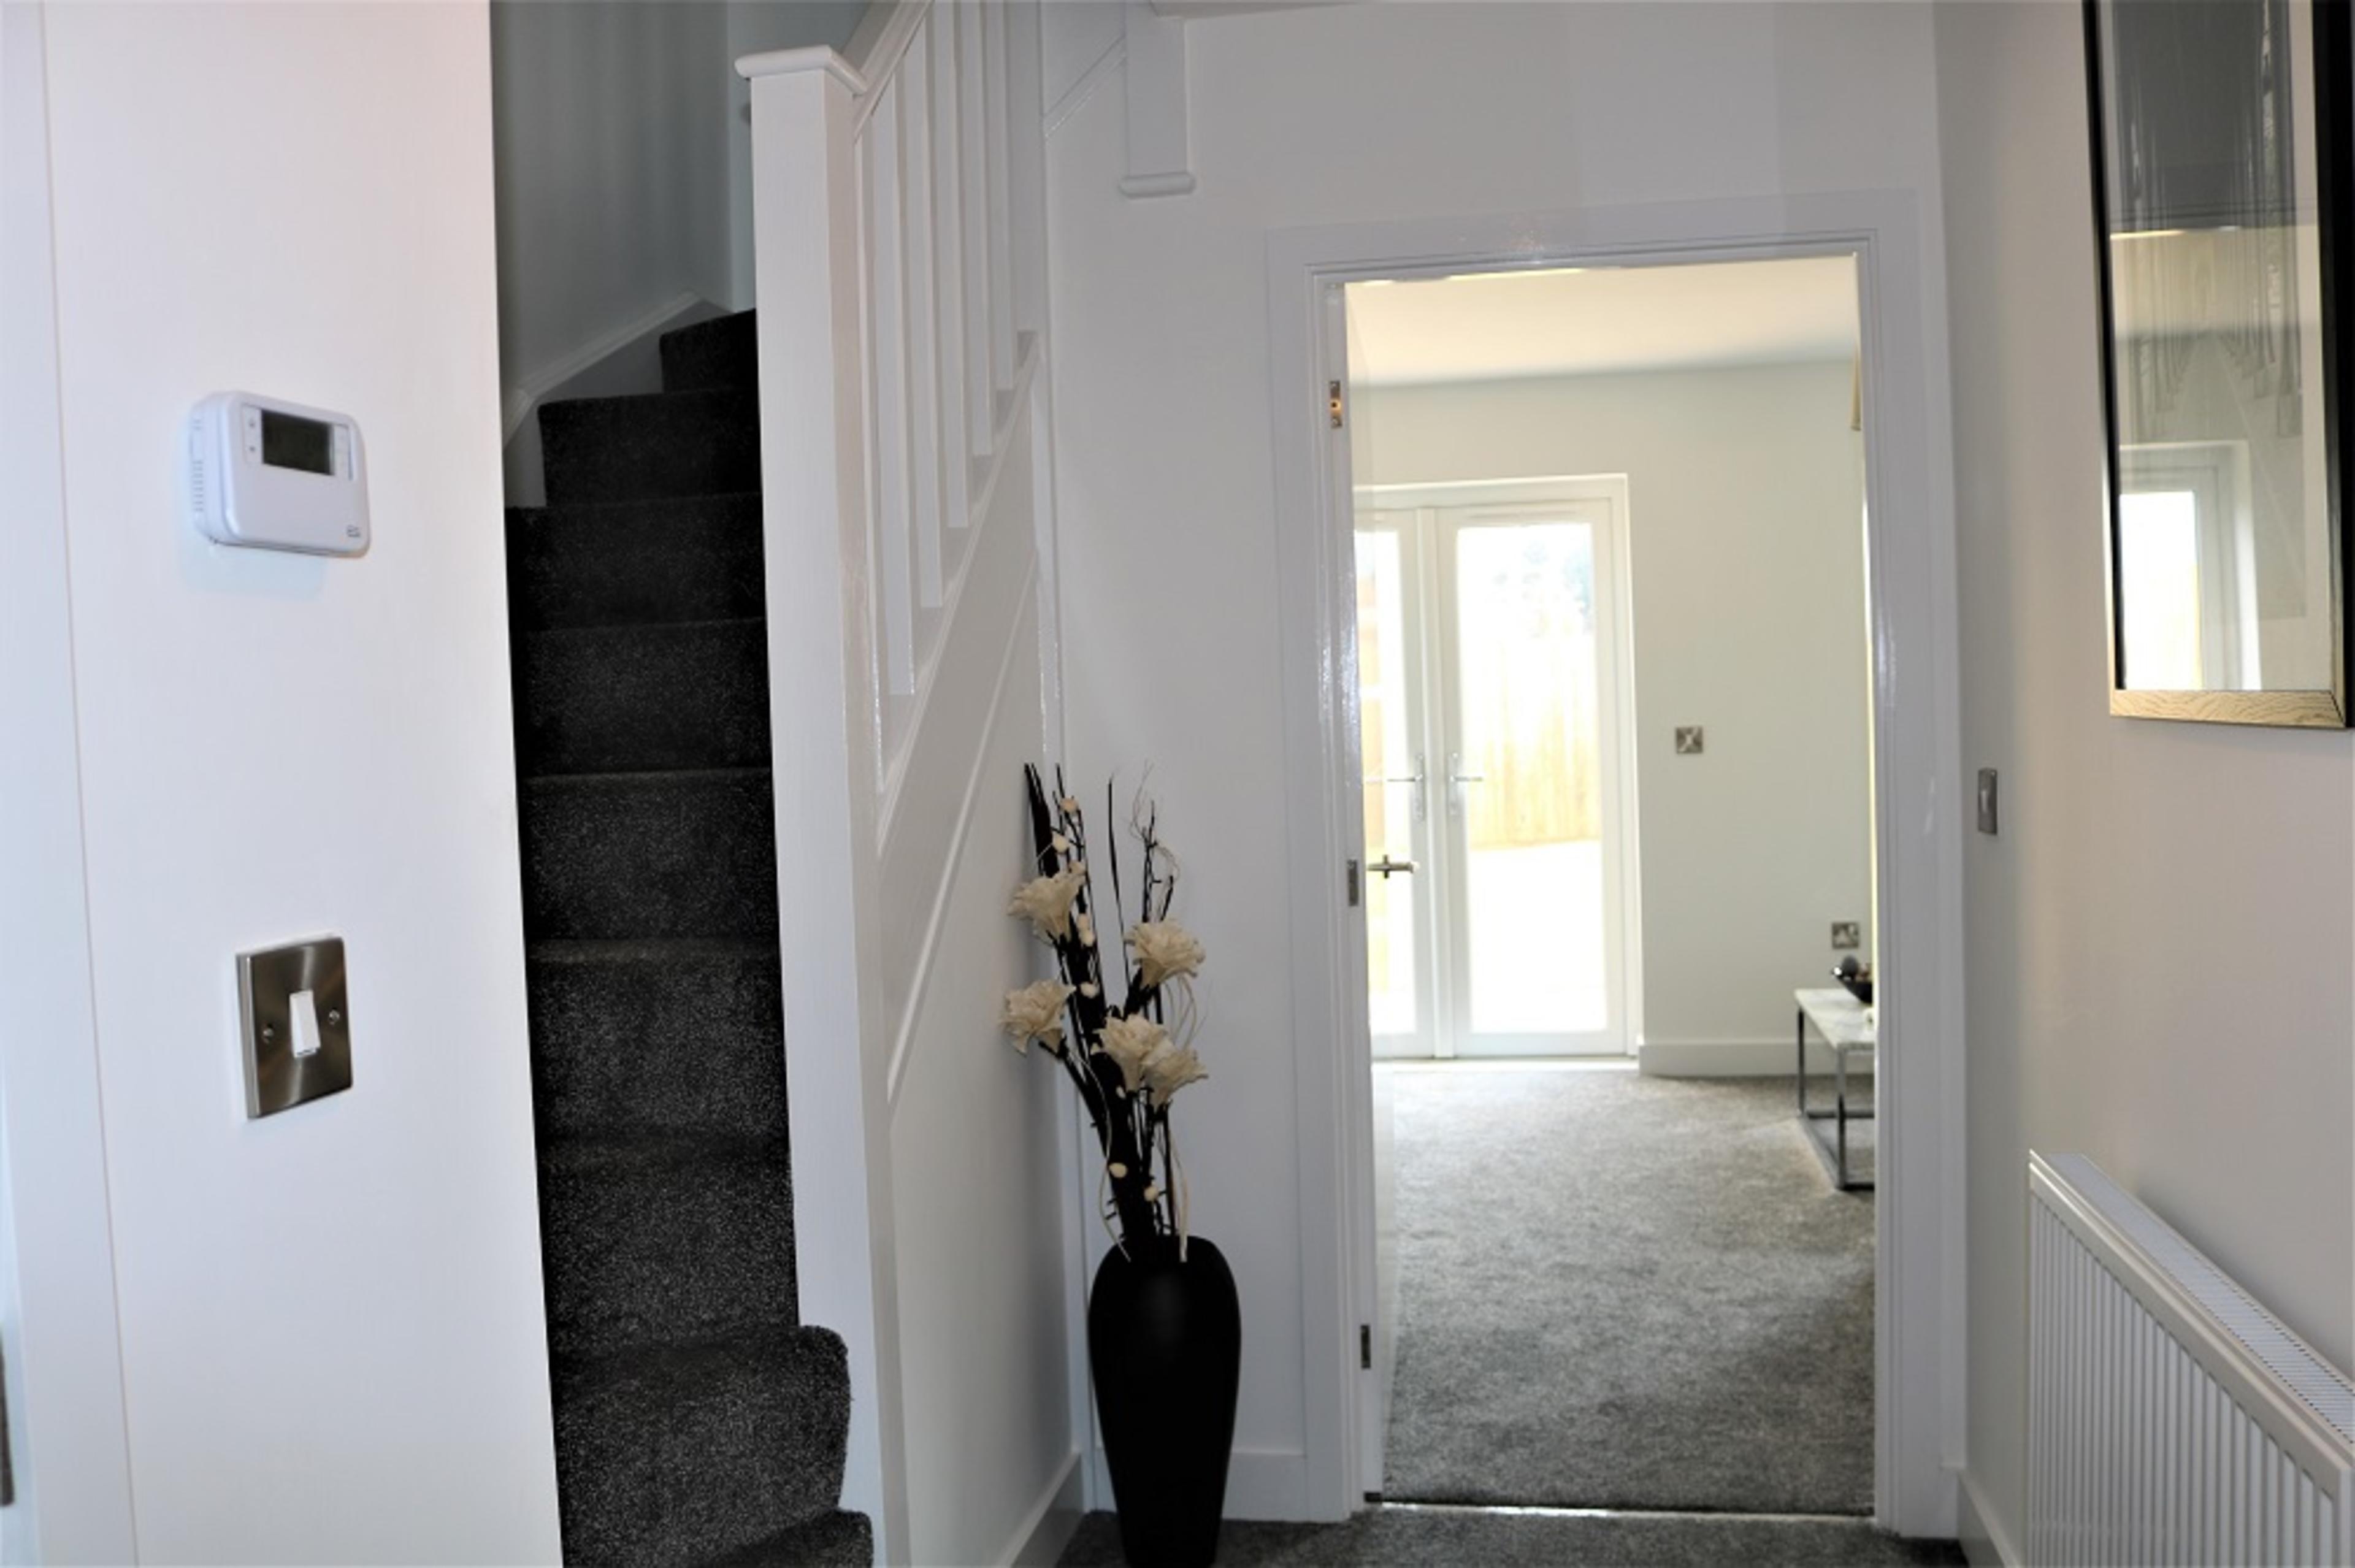 woolner-brook-new-build-gem-2-bed-hallway